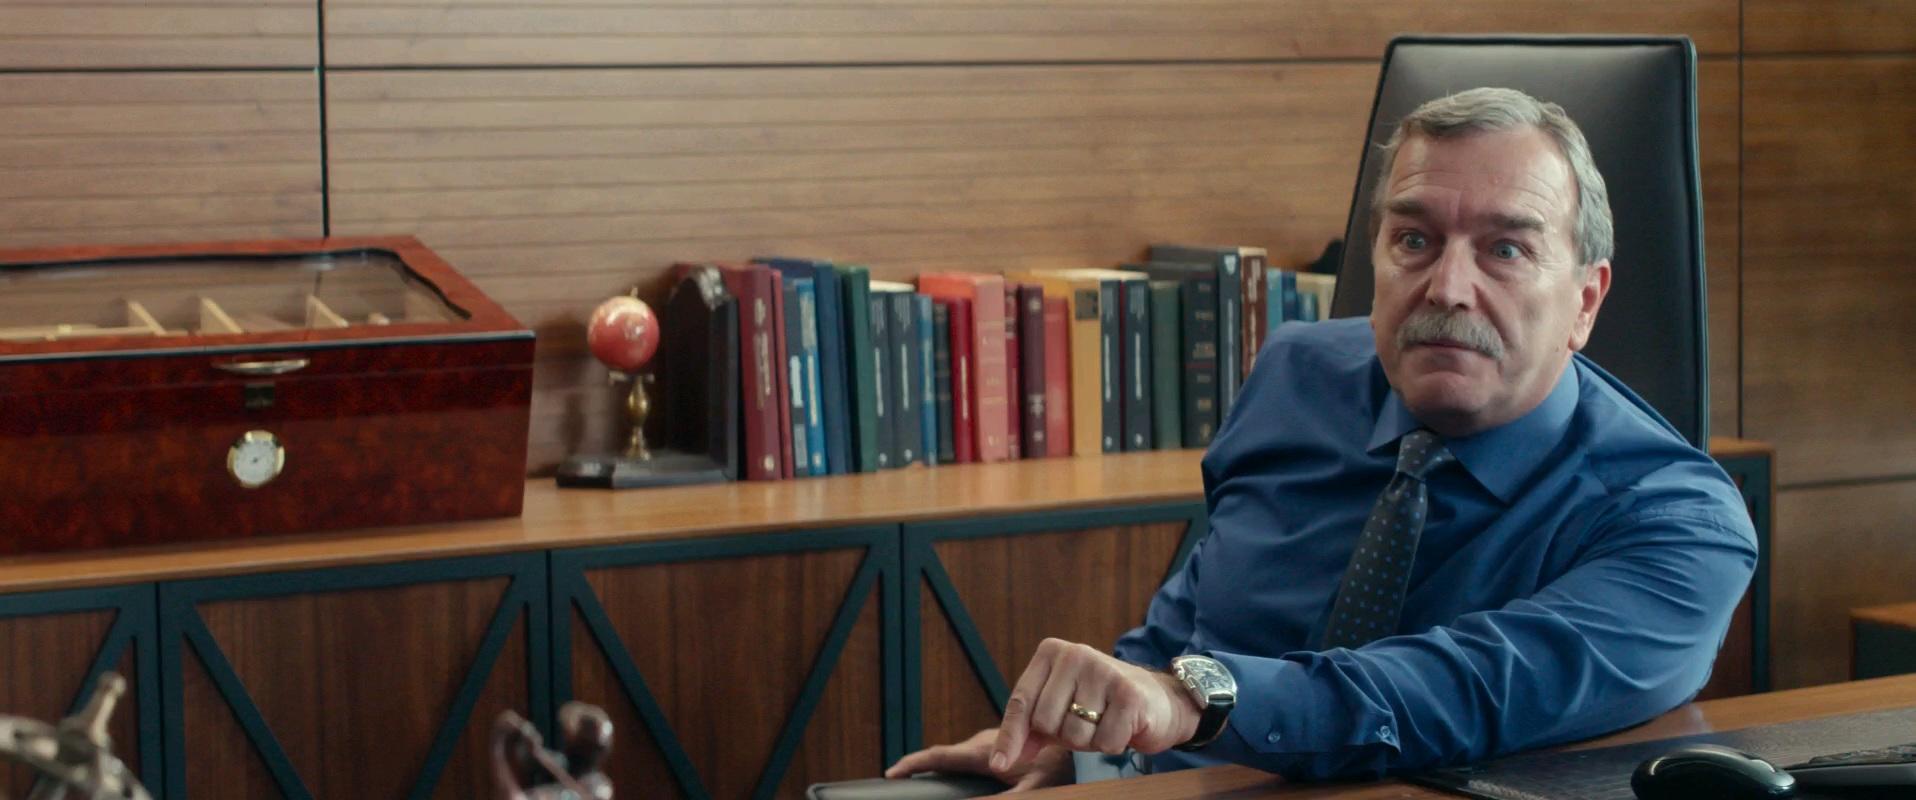 Bizi Hatırla | 2018 | Yerli Film | WEB-DL | XviD | Sansürsüz | 1080p - m720p - m1080p | WEB-DL | Tek Link